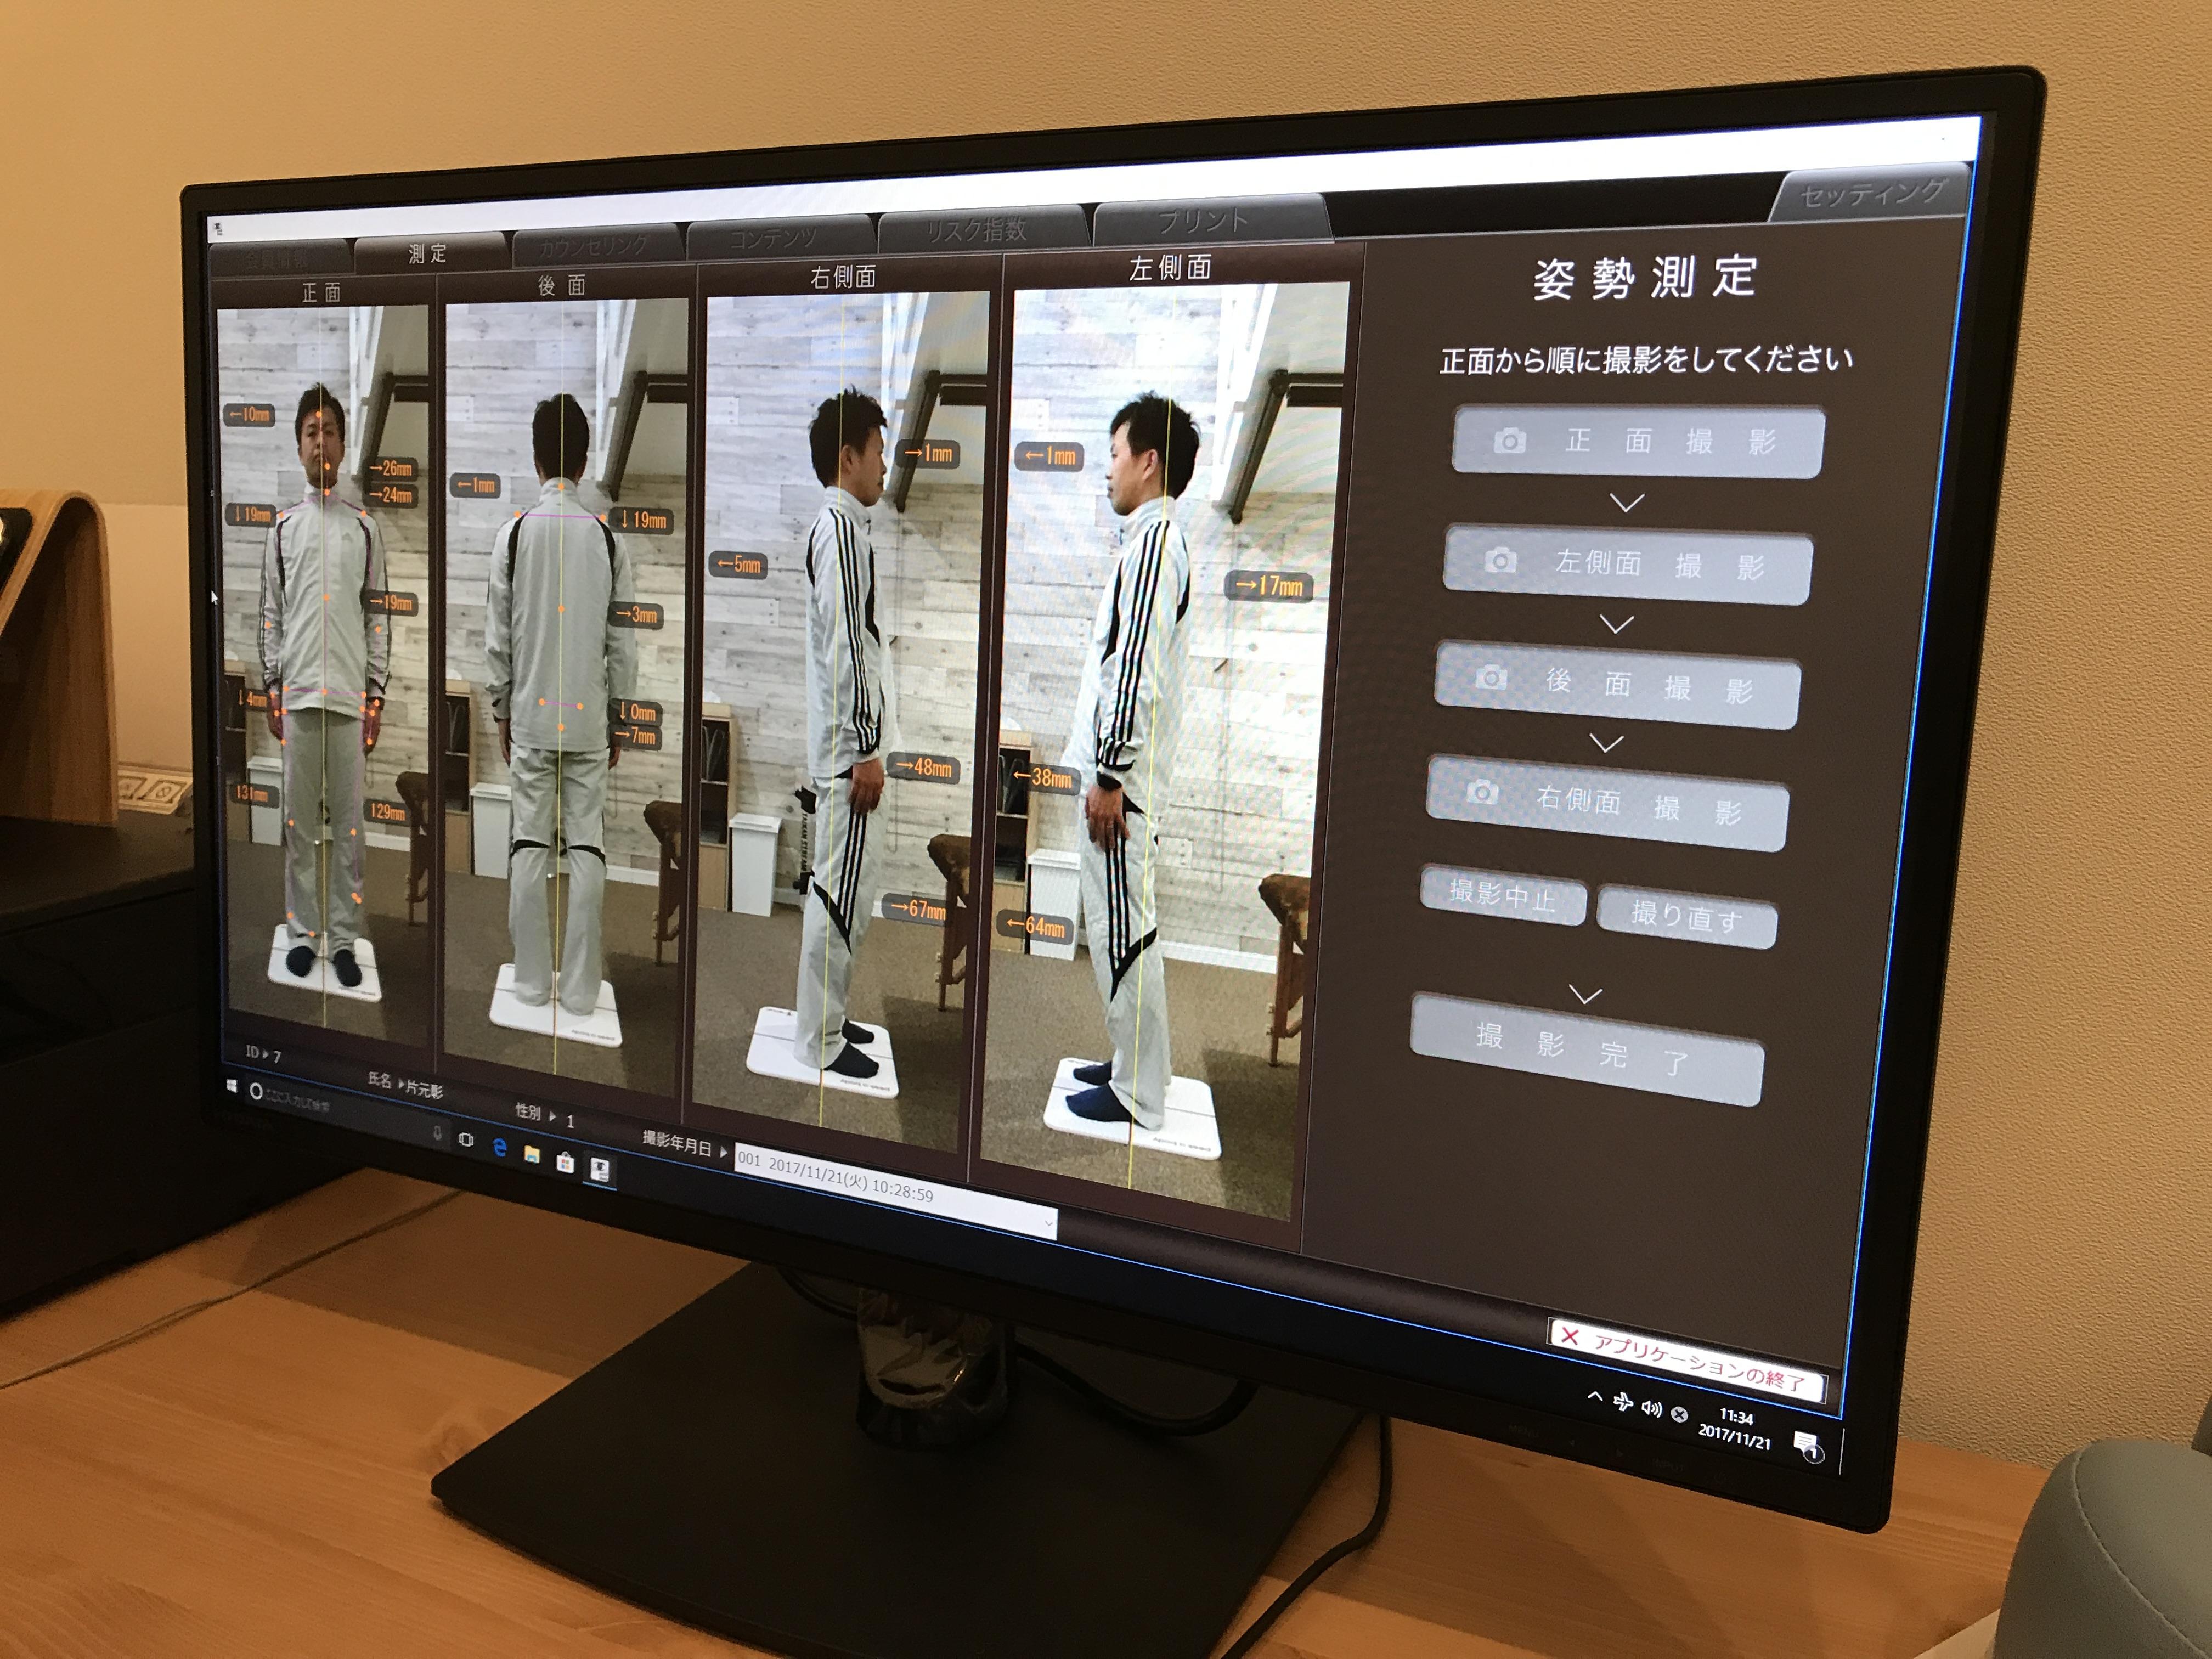 【PR】Body make整体フィジオ(新潟市中央区寺裏通一番町)体の悩みを科学的に検証。オーダーメイドの治療をしてくれる整体院。